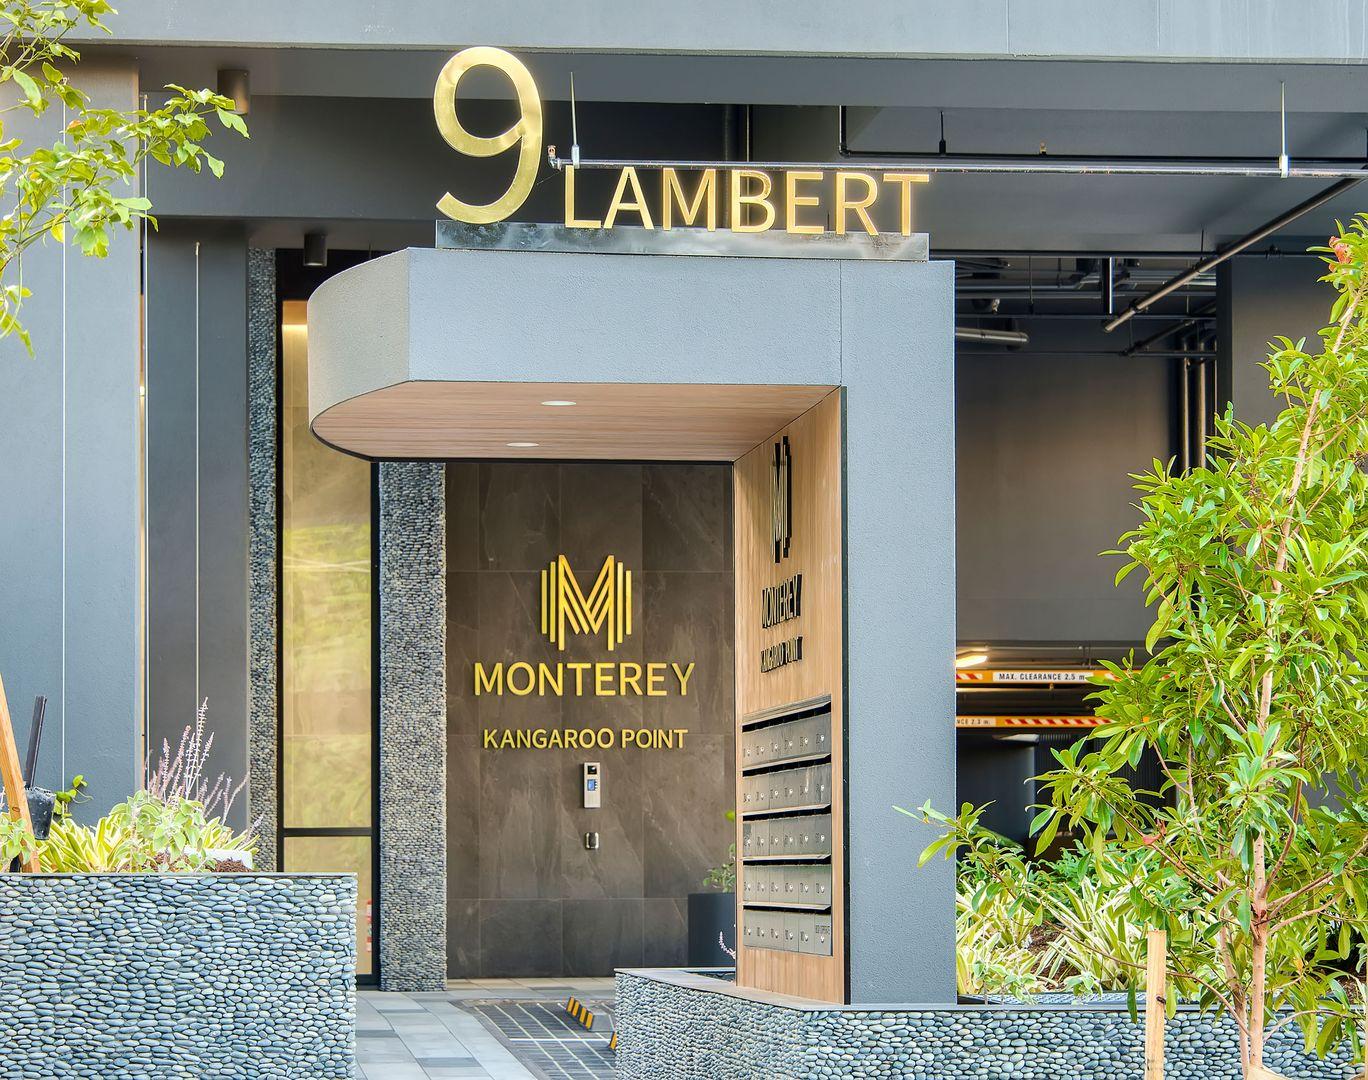 102/9 Lambert Street, Kangaroo Point QLD 4169, Image 1